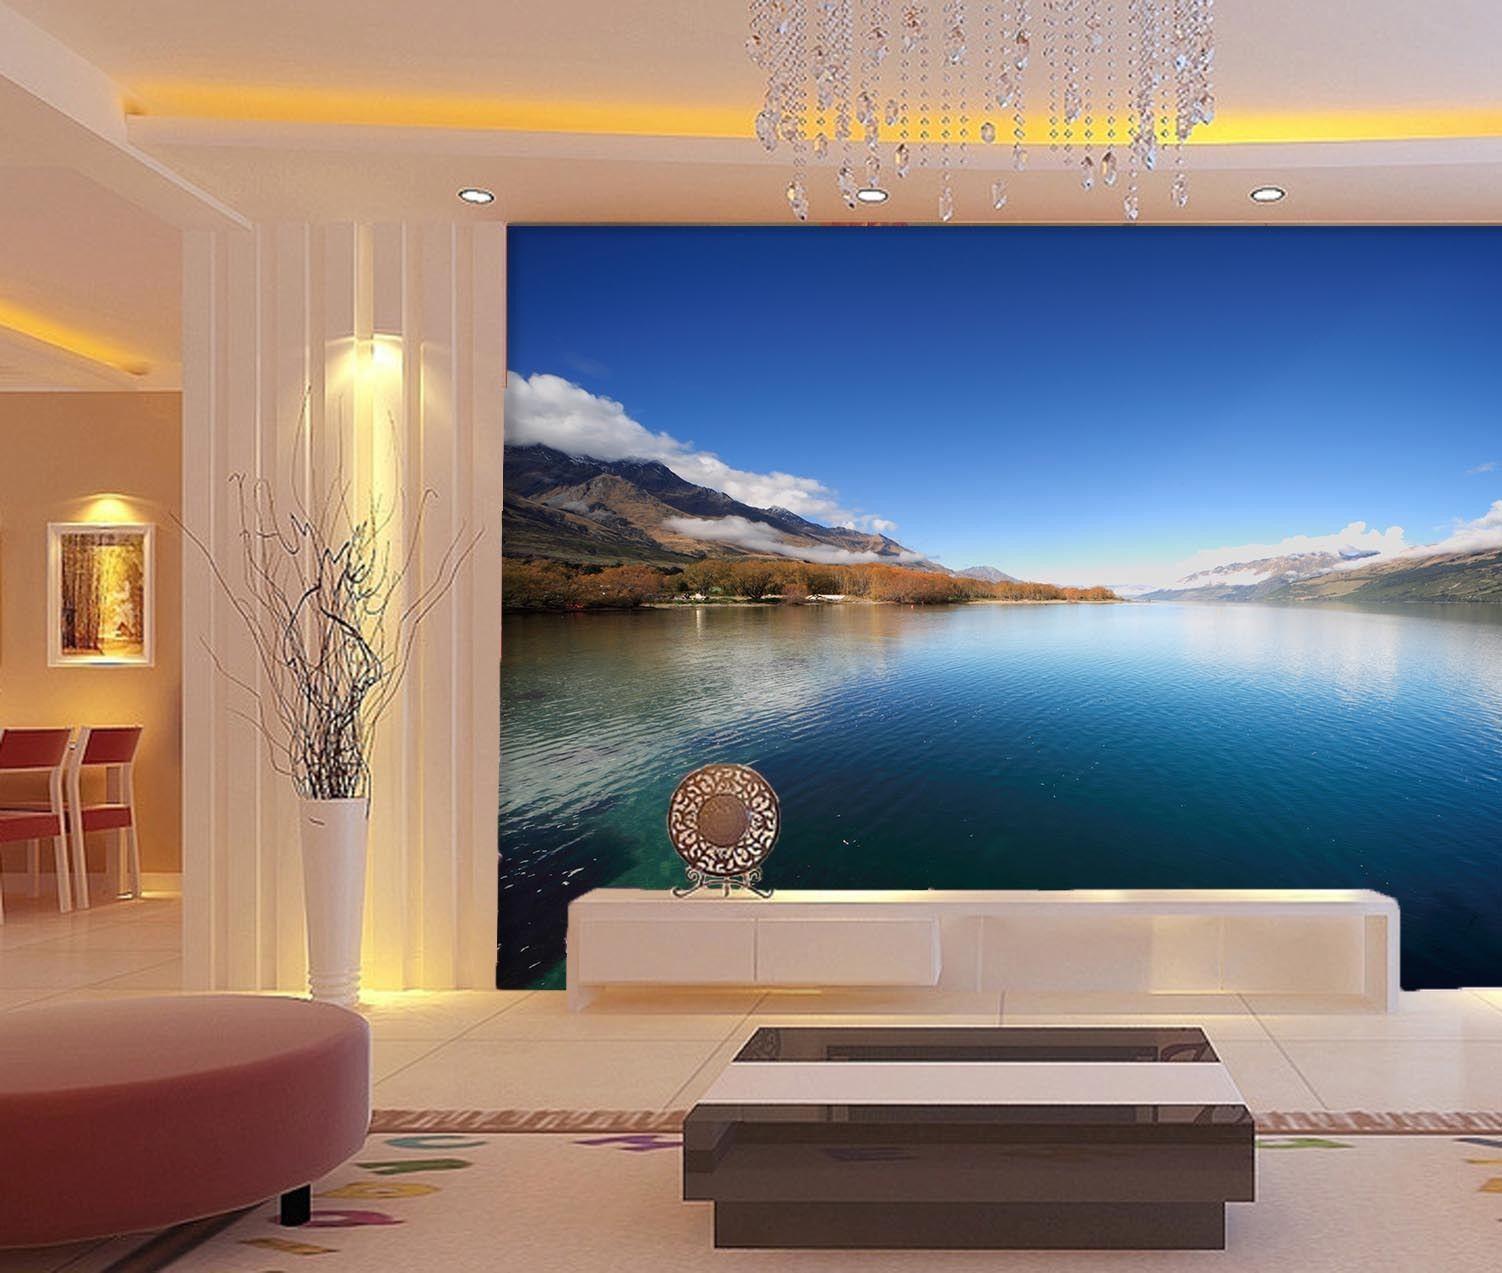 3D Vast See, Schönheit 255 Fototapeten Wandbild Fototapete BildTapete Familie - $52.21 - $323.81